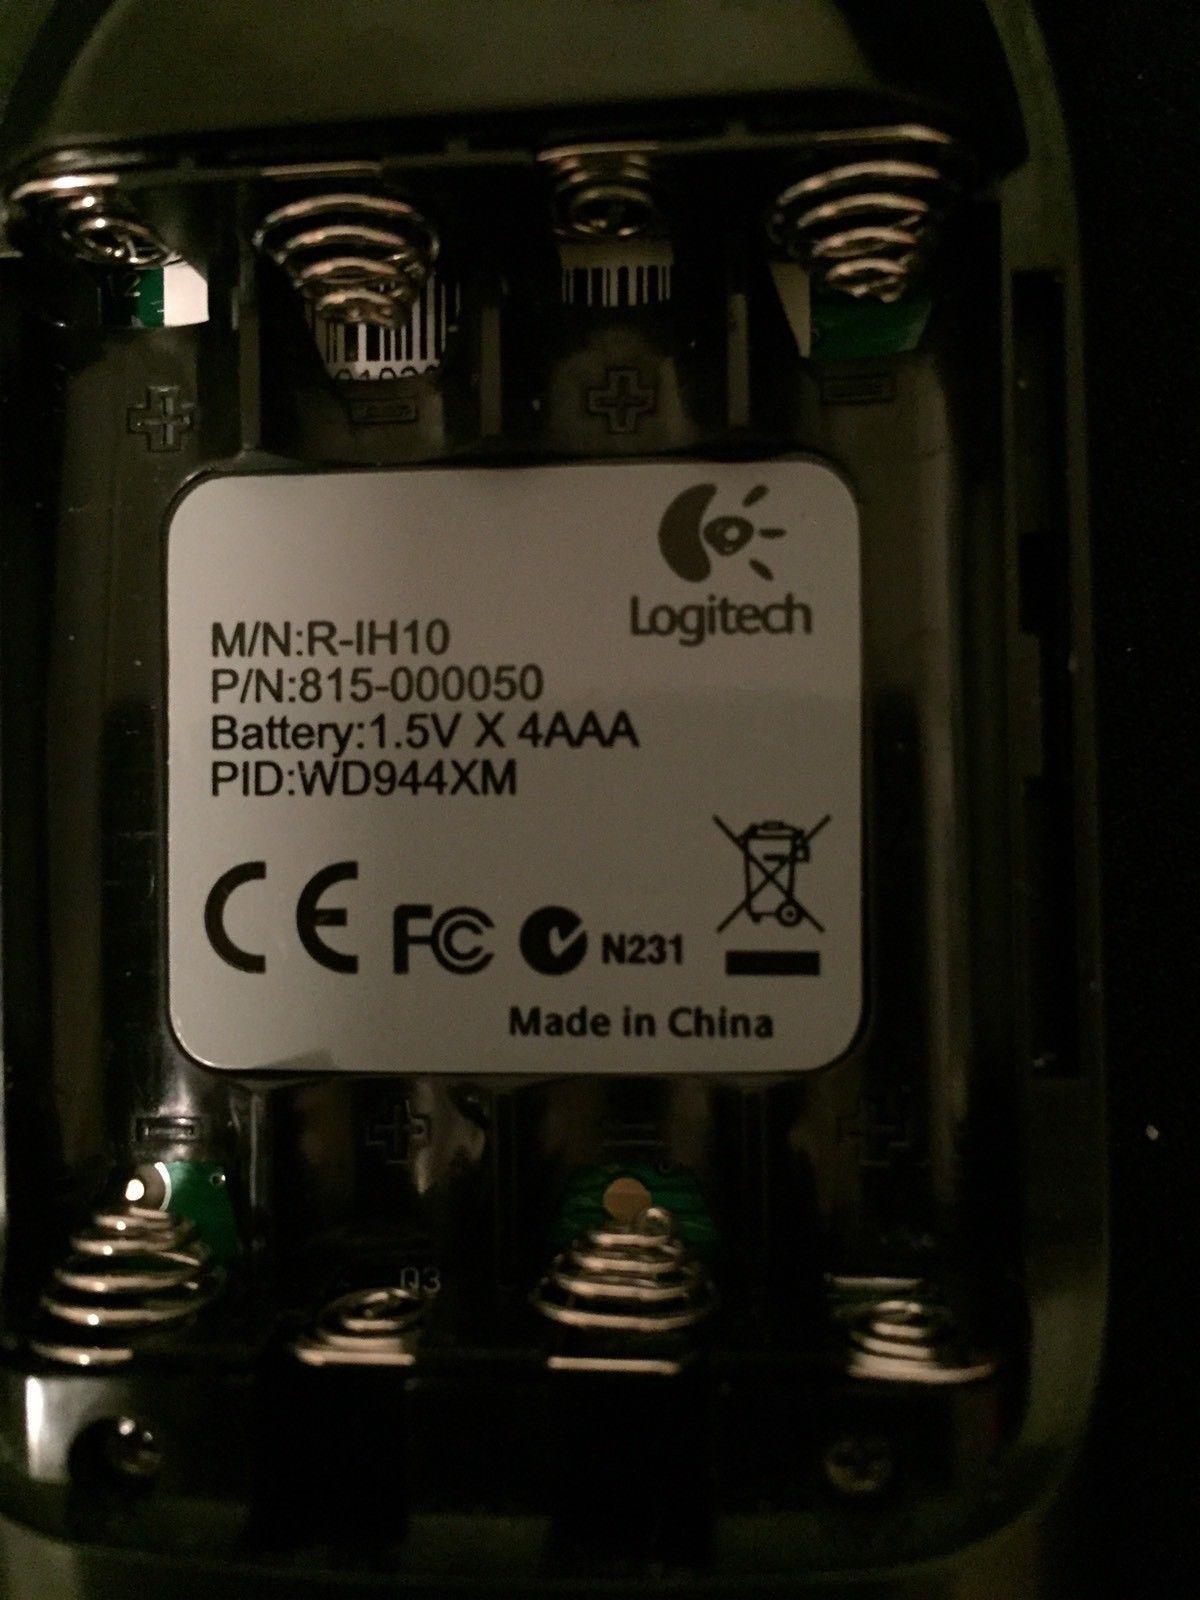 Logitech HARMONY 510 Advanced Universal Remote Control